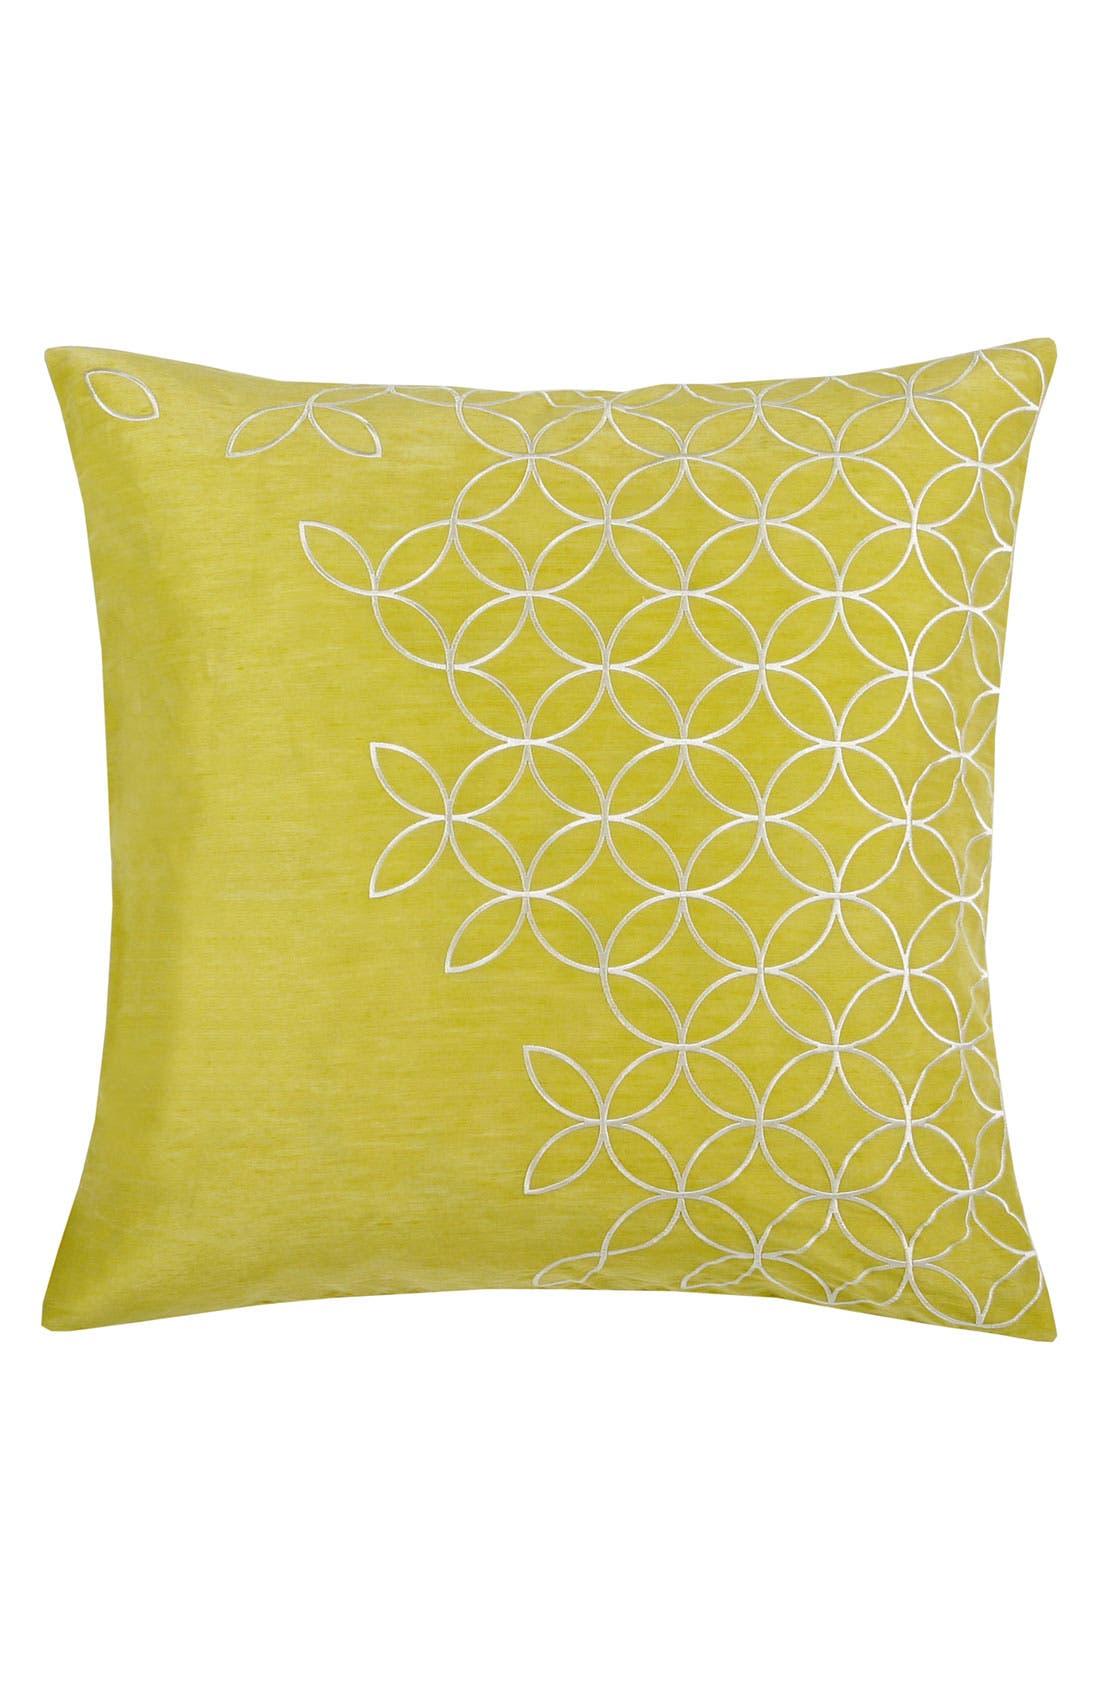 Alternate Image 1 Selected - Blissliving Home 'Latham' Pillow